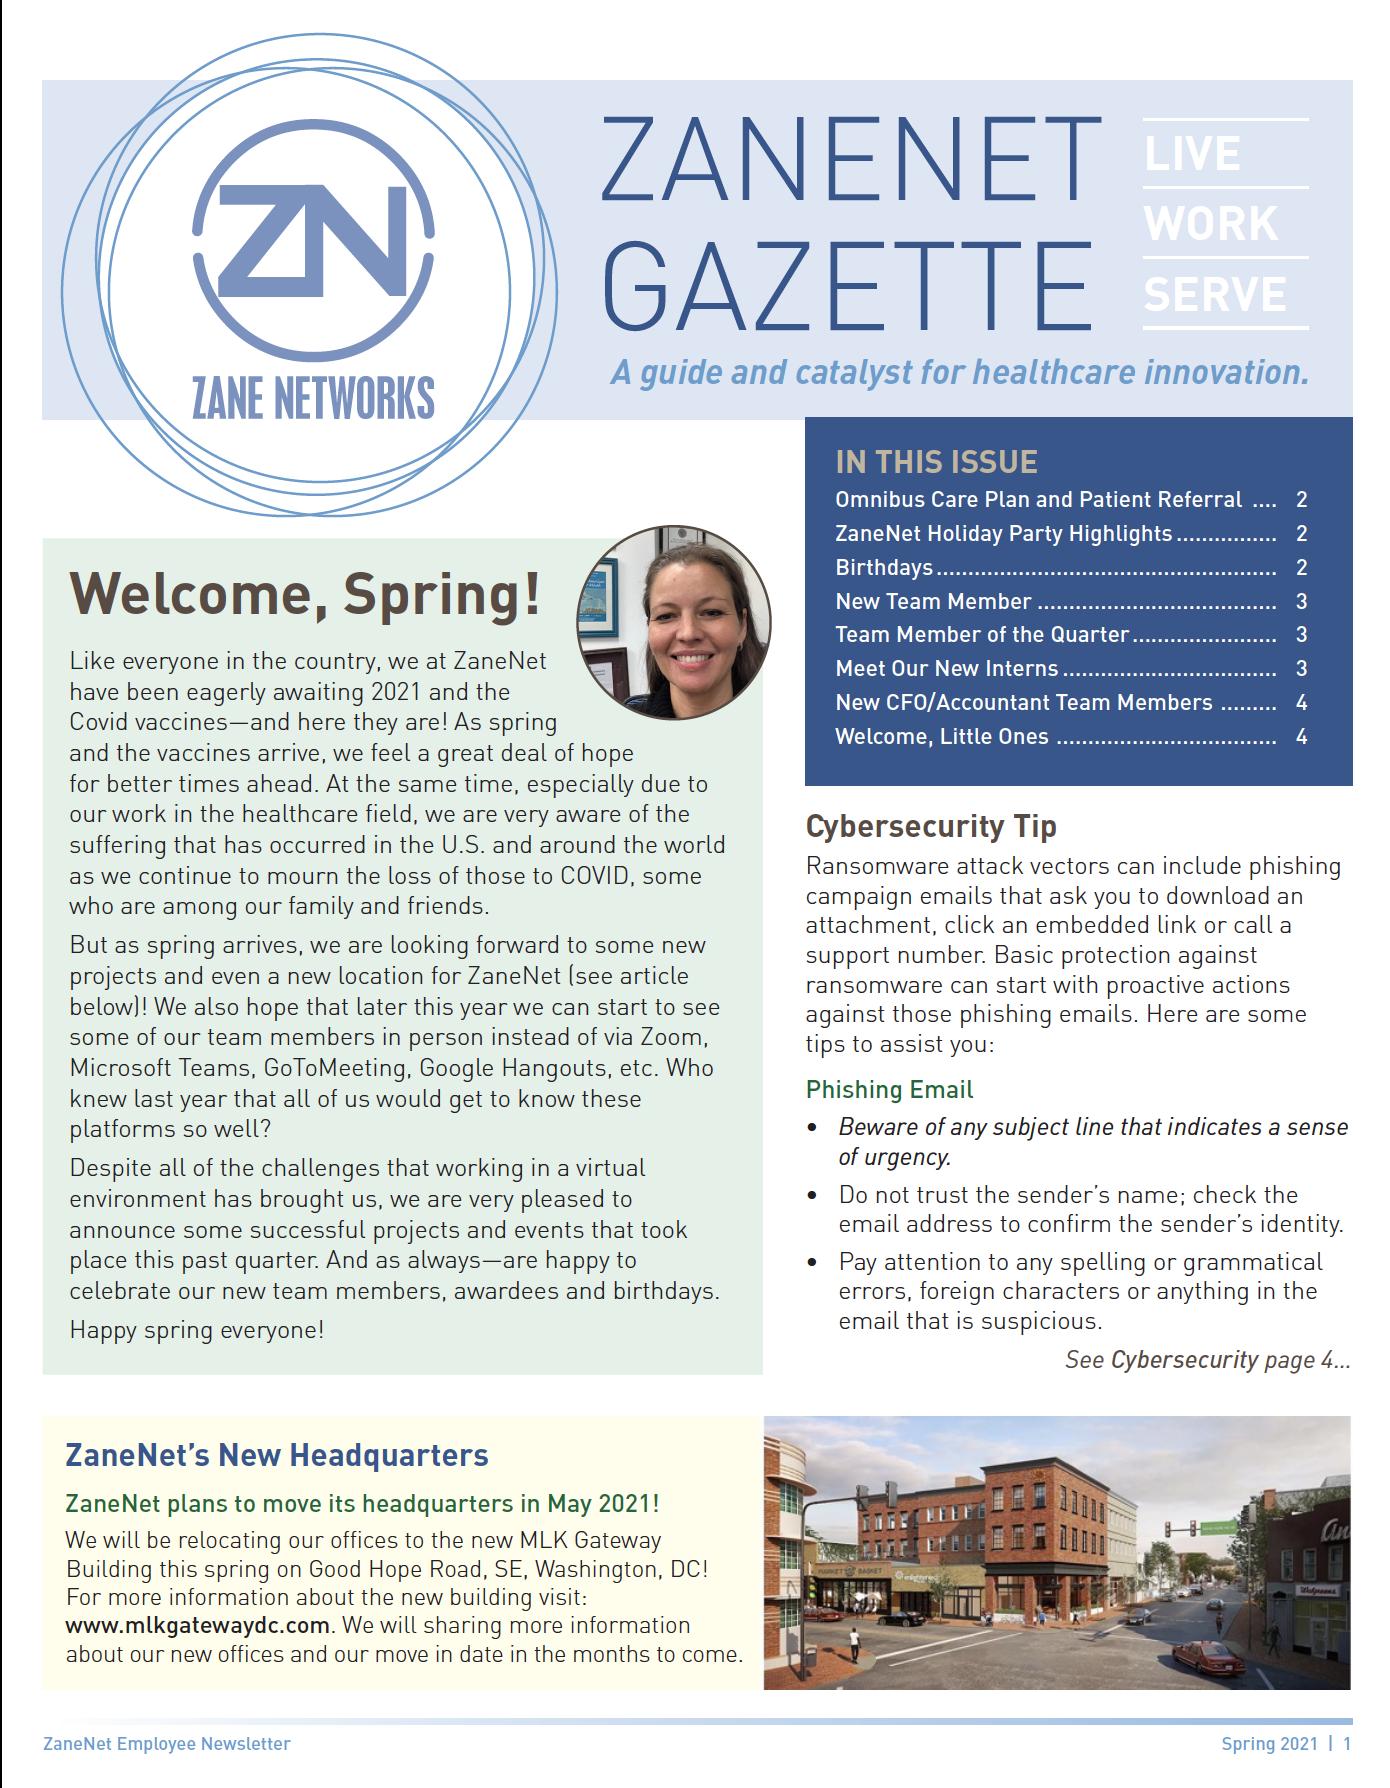 Zane Networks Spring 2021